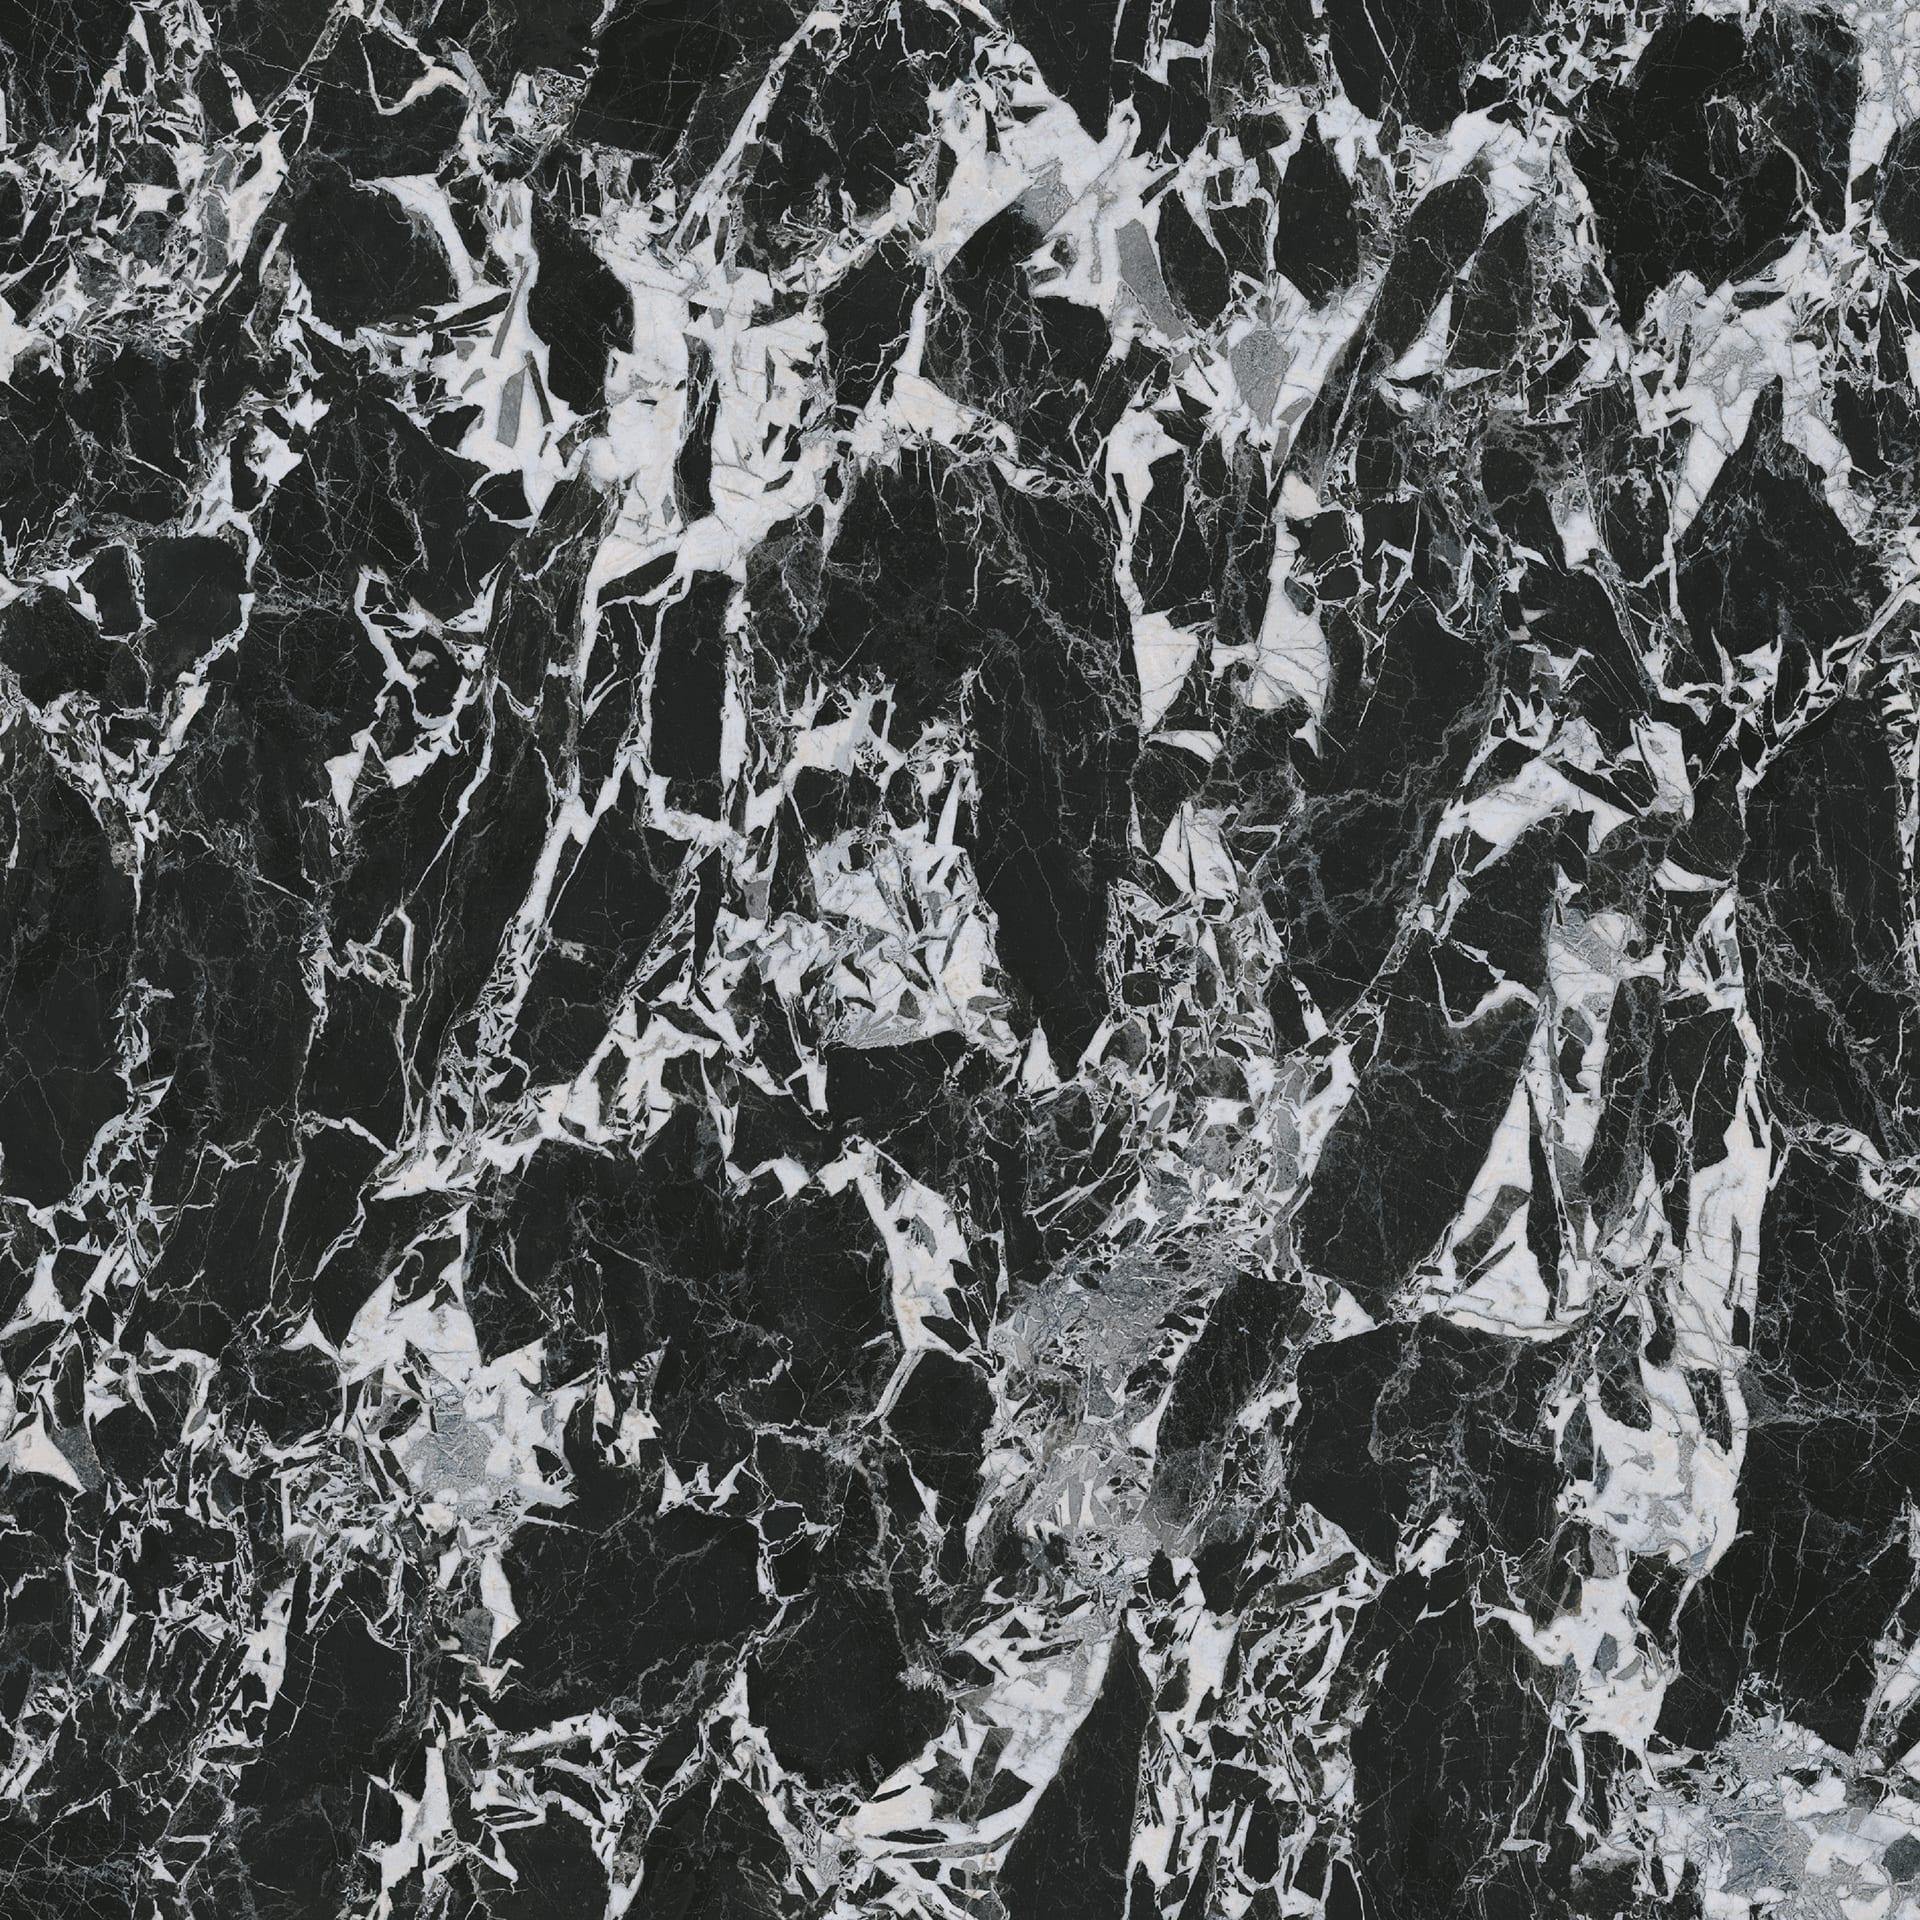 Black Marble Close Laminate Worktop by Topform